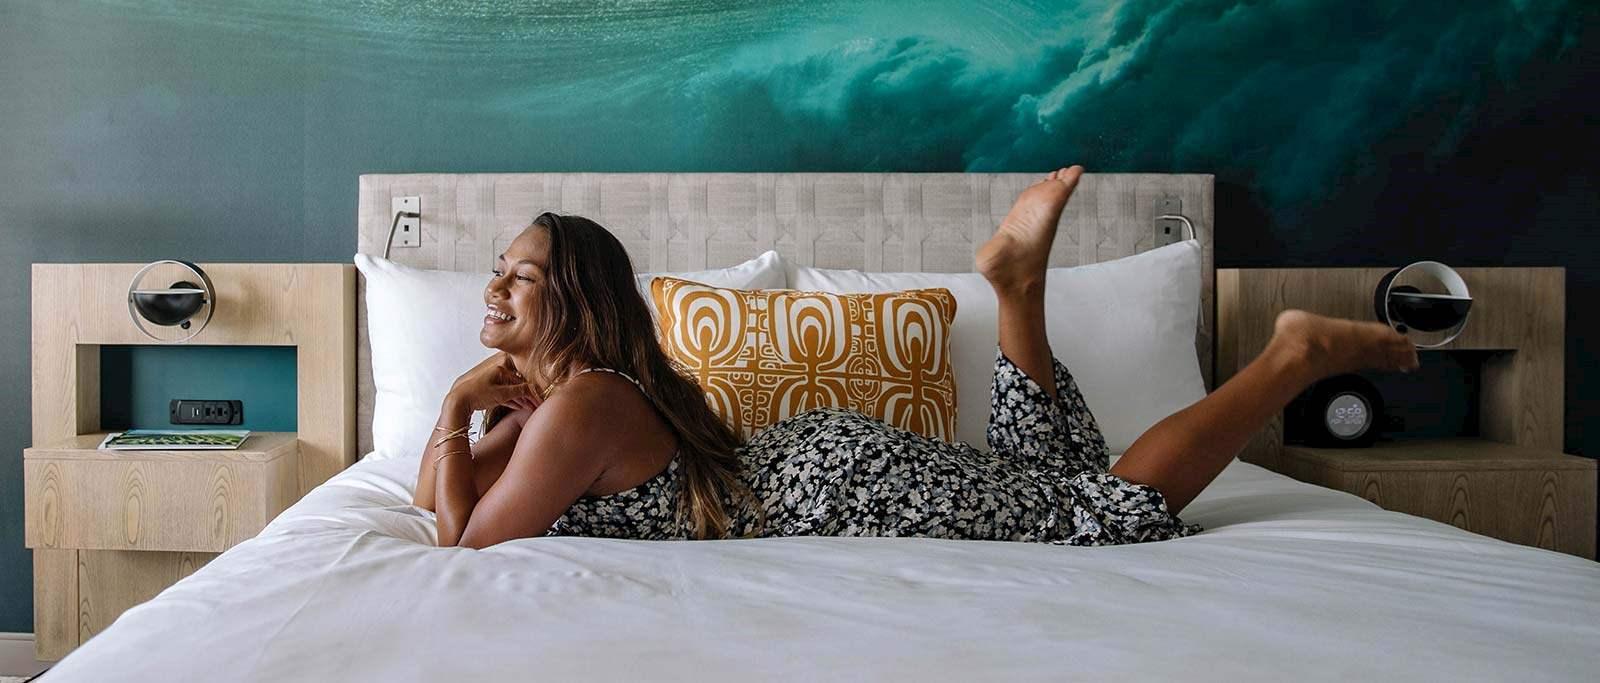 Amenities of Waikiki Beachcomber by Outrigger, Honolulu